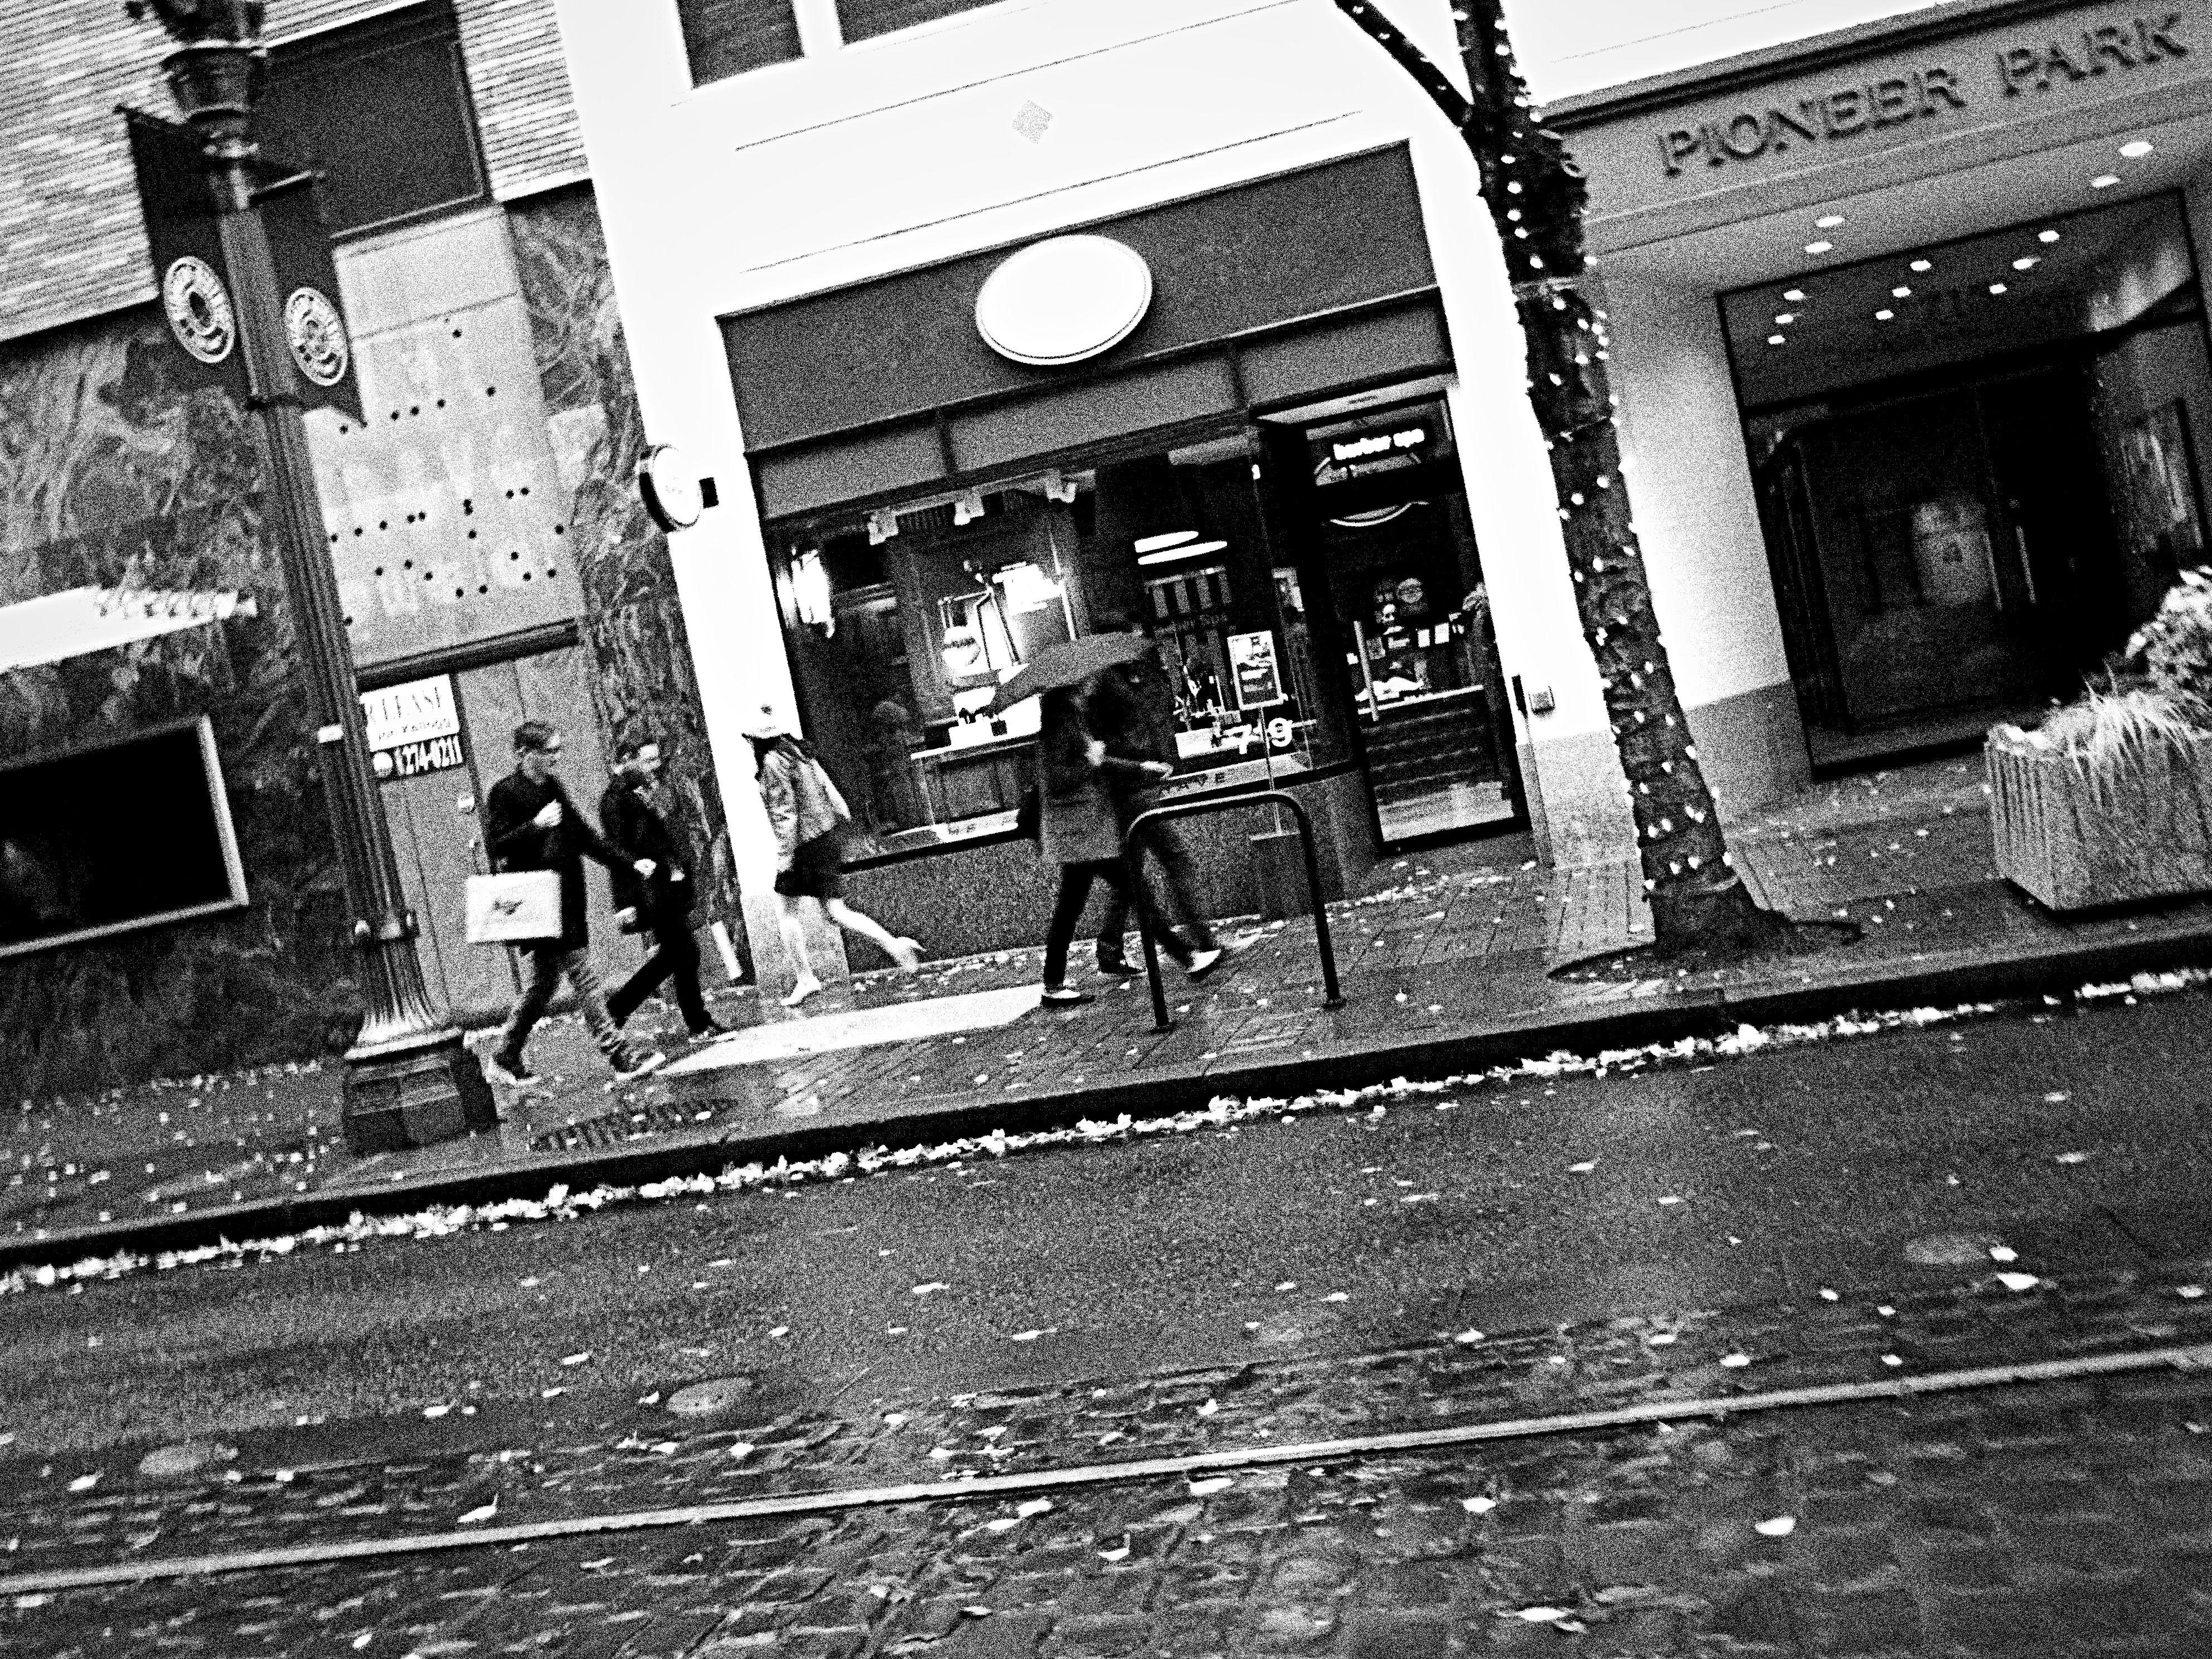 Downtown Portland, Oregon Downtown portland, Oregon